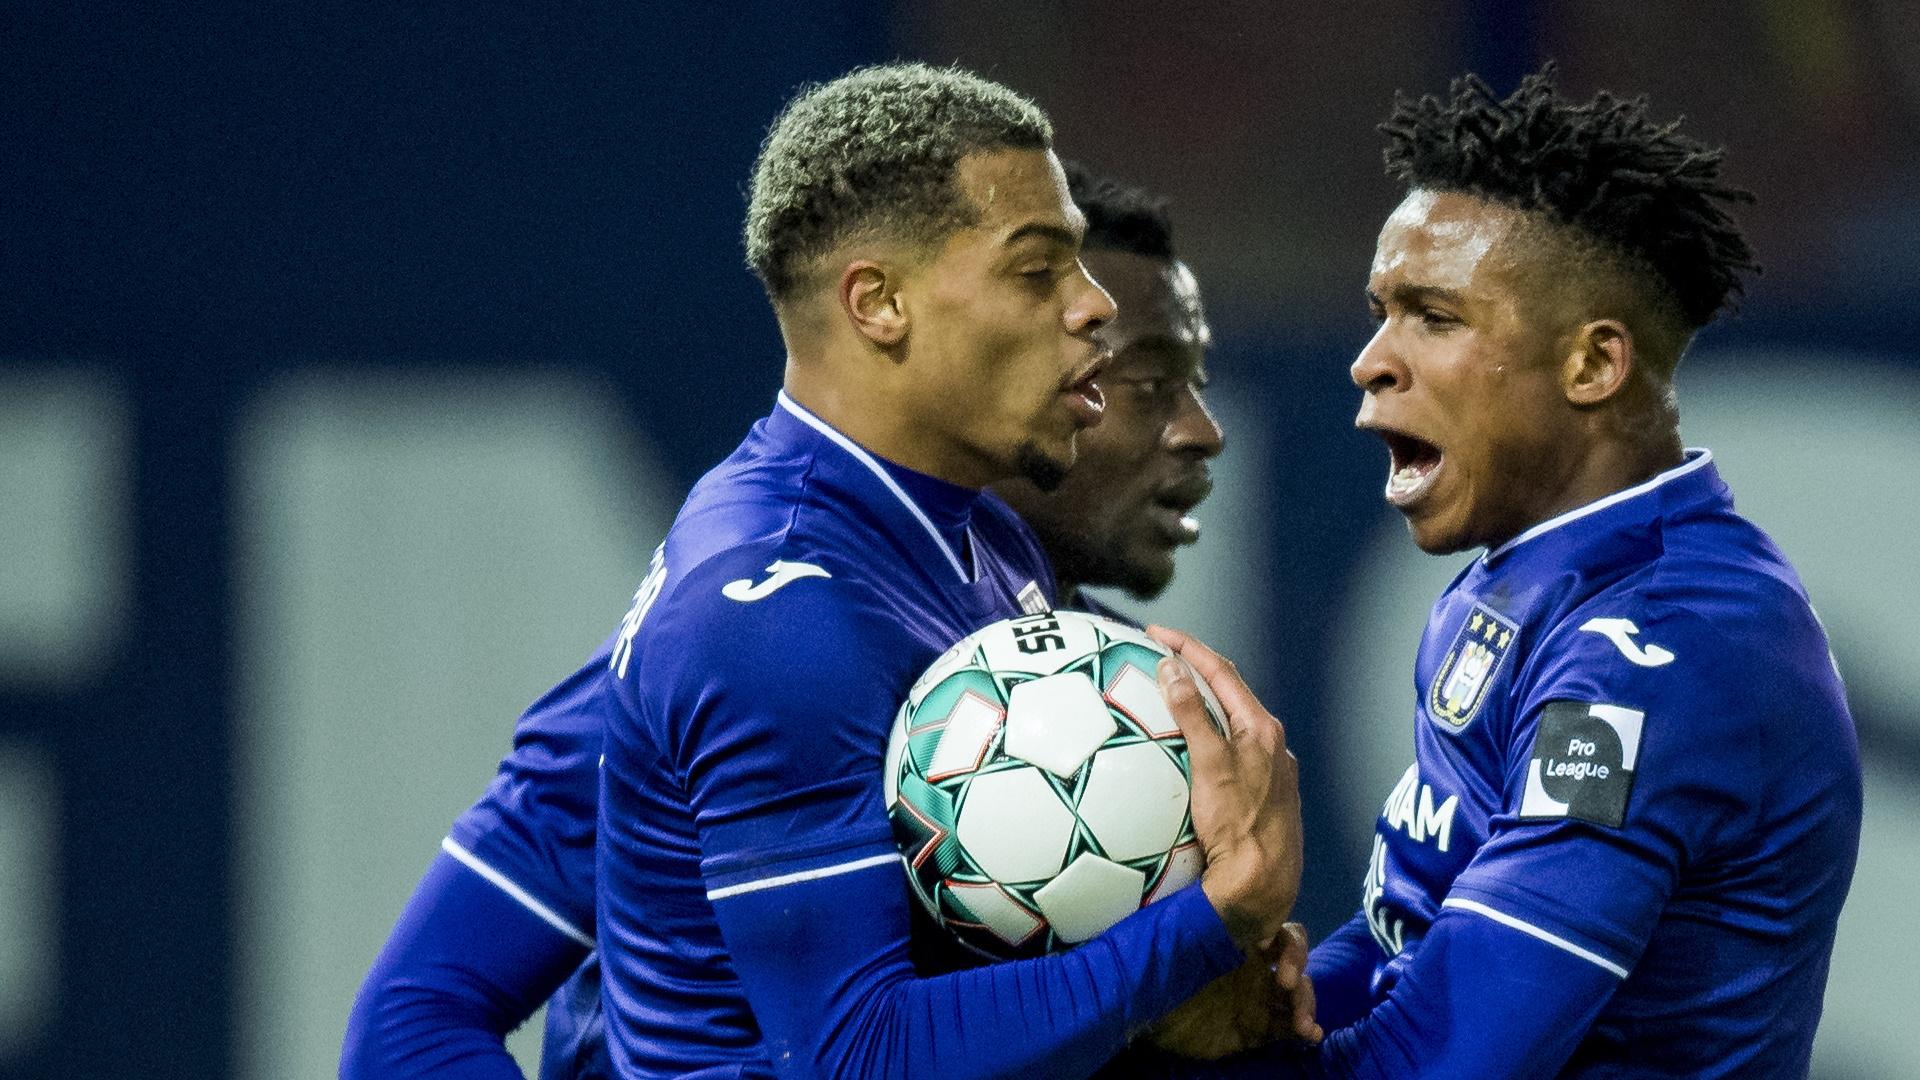 Nmecha-Mukairu double act not enough for Anderlecht